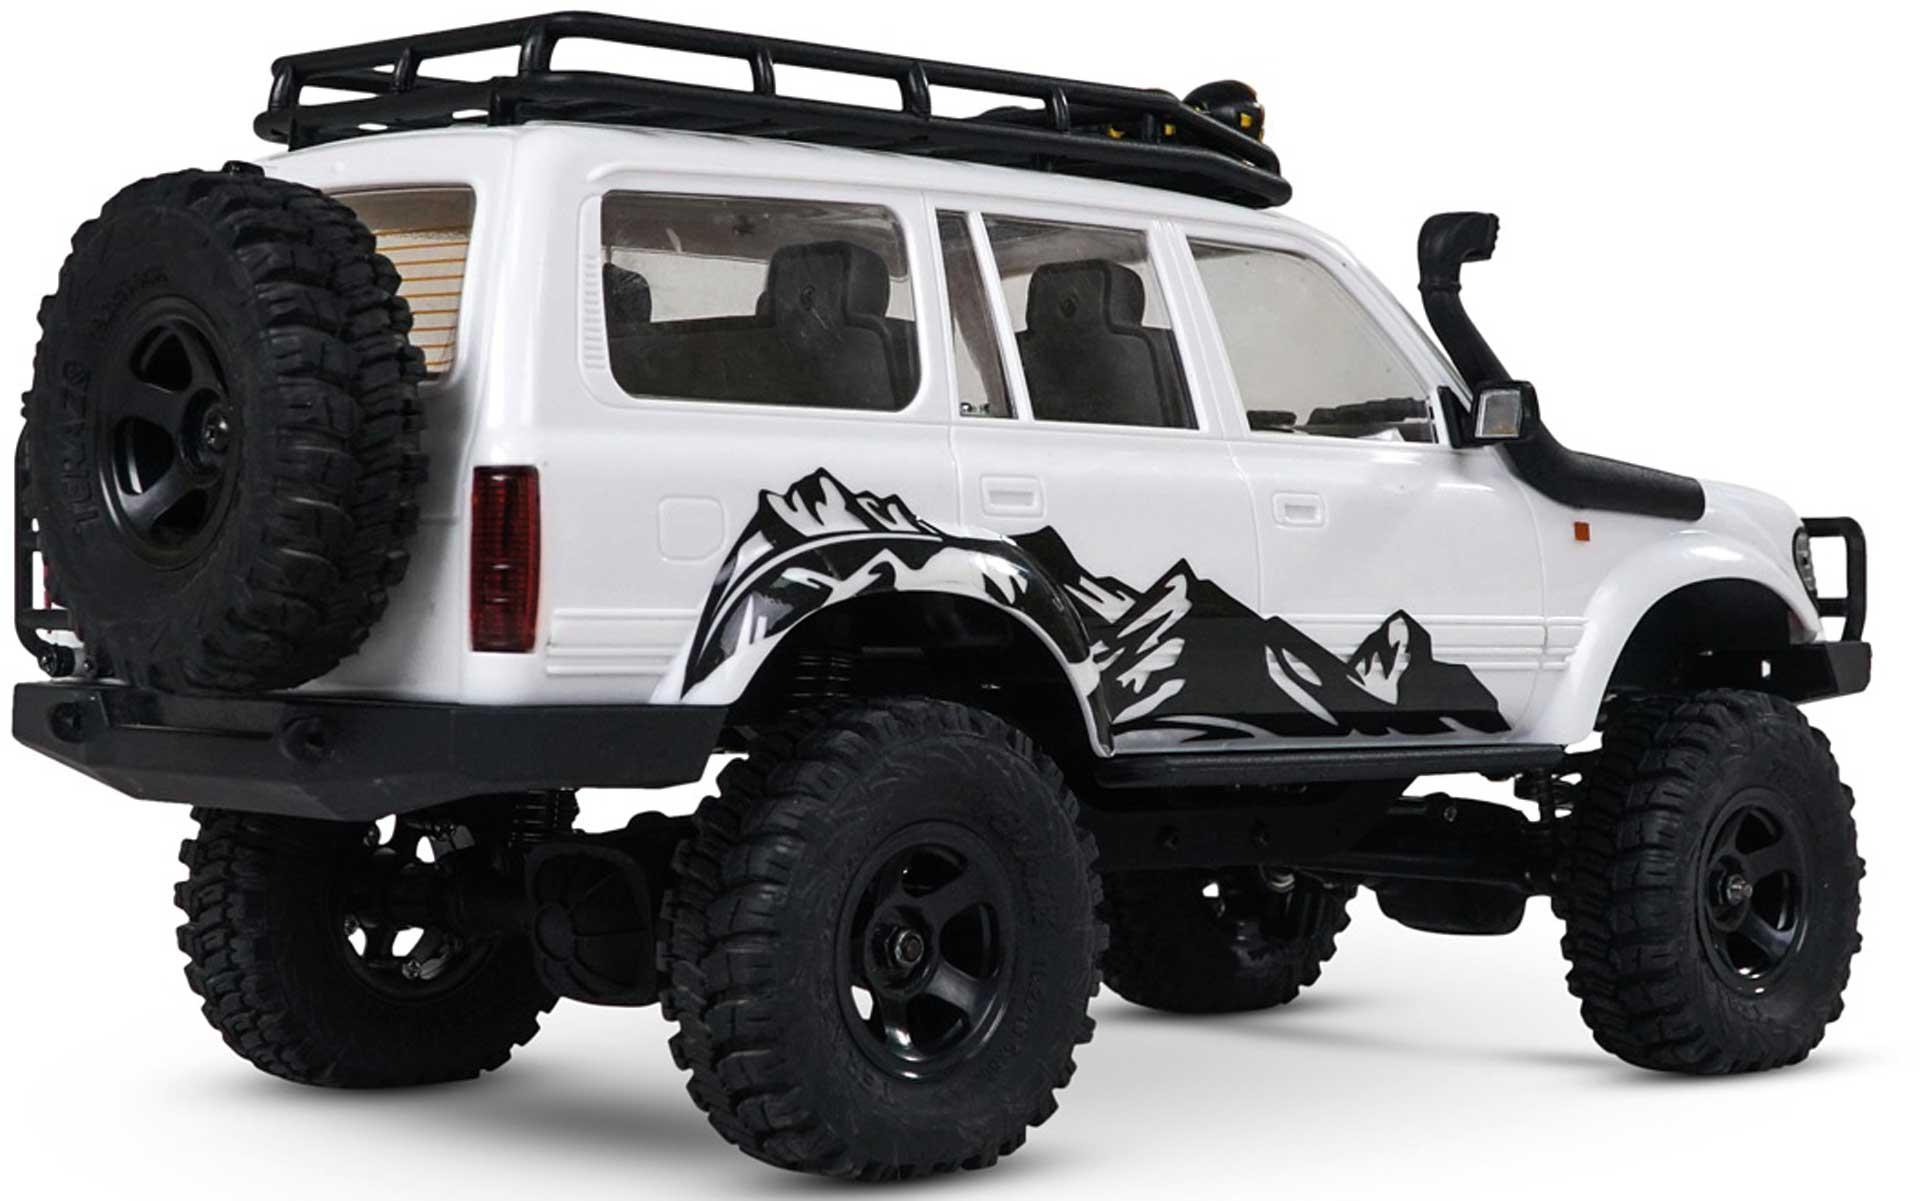 EAZY RC PATRIOT 1/18 4WD - Crawler RTR 2.4GHz inklusive 2 Akkus